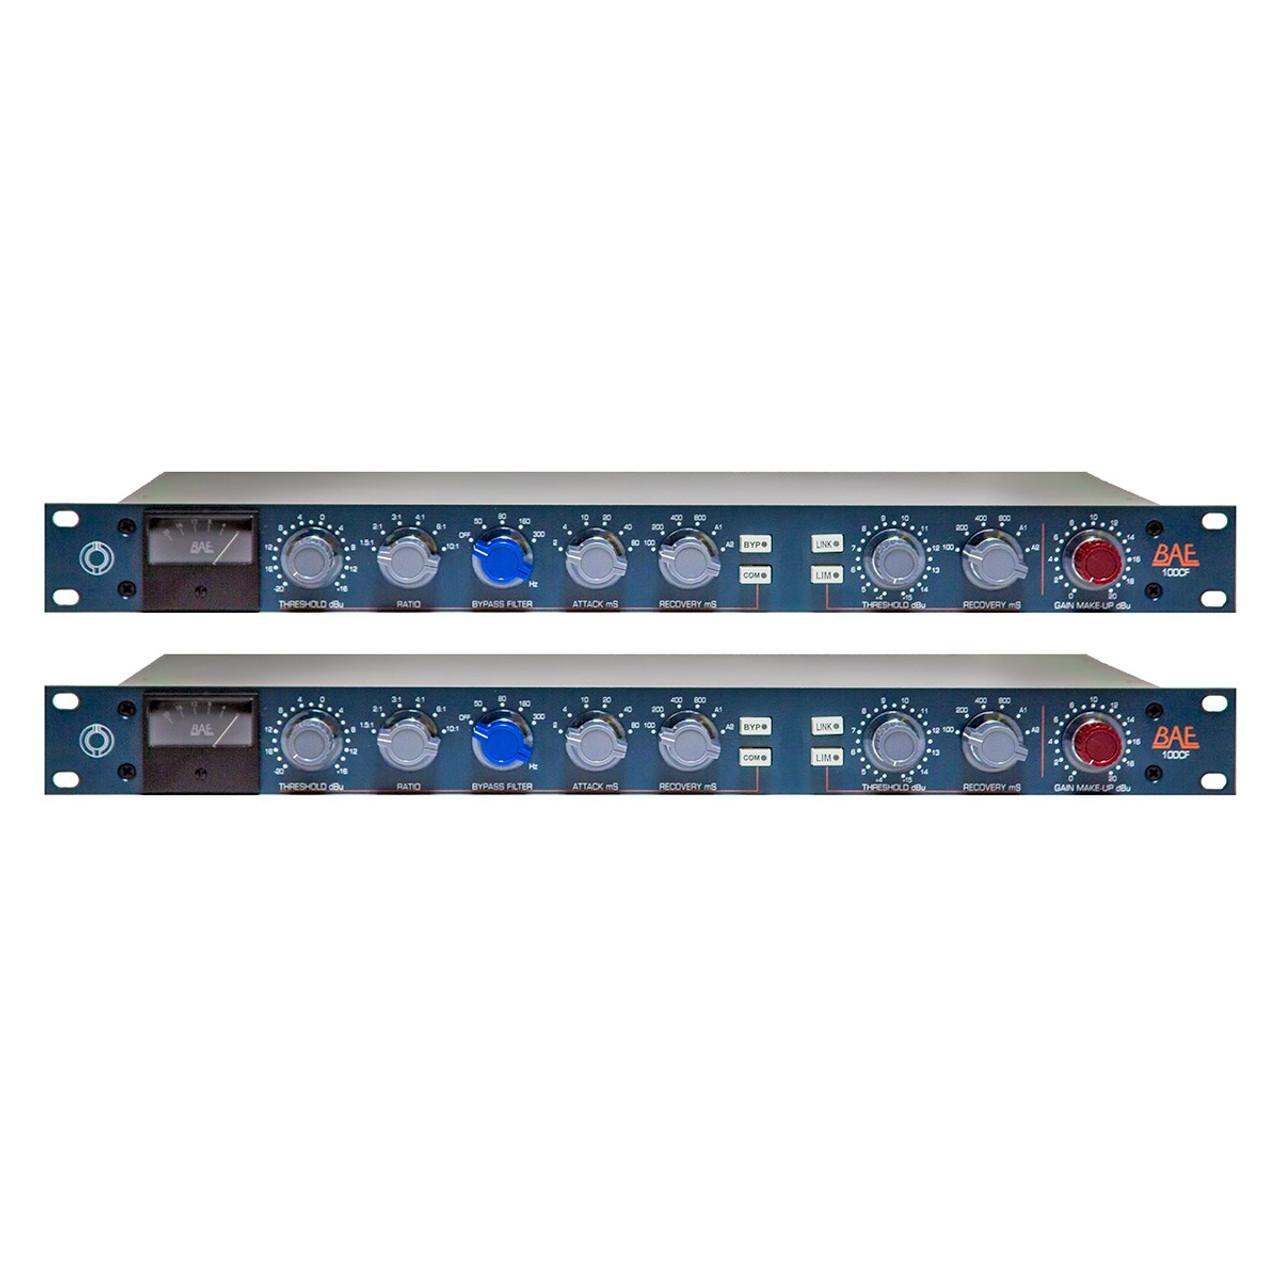 Bae 10dcf Stereo Pair Zenpro Audio